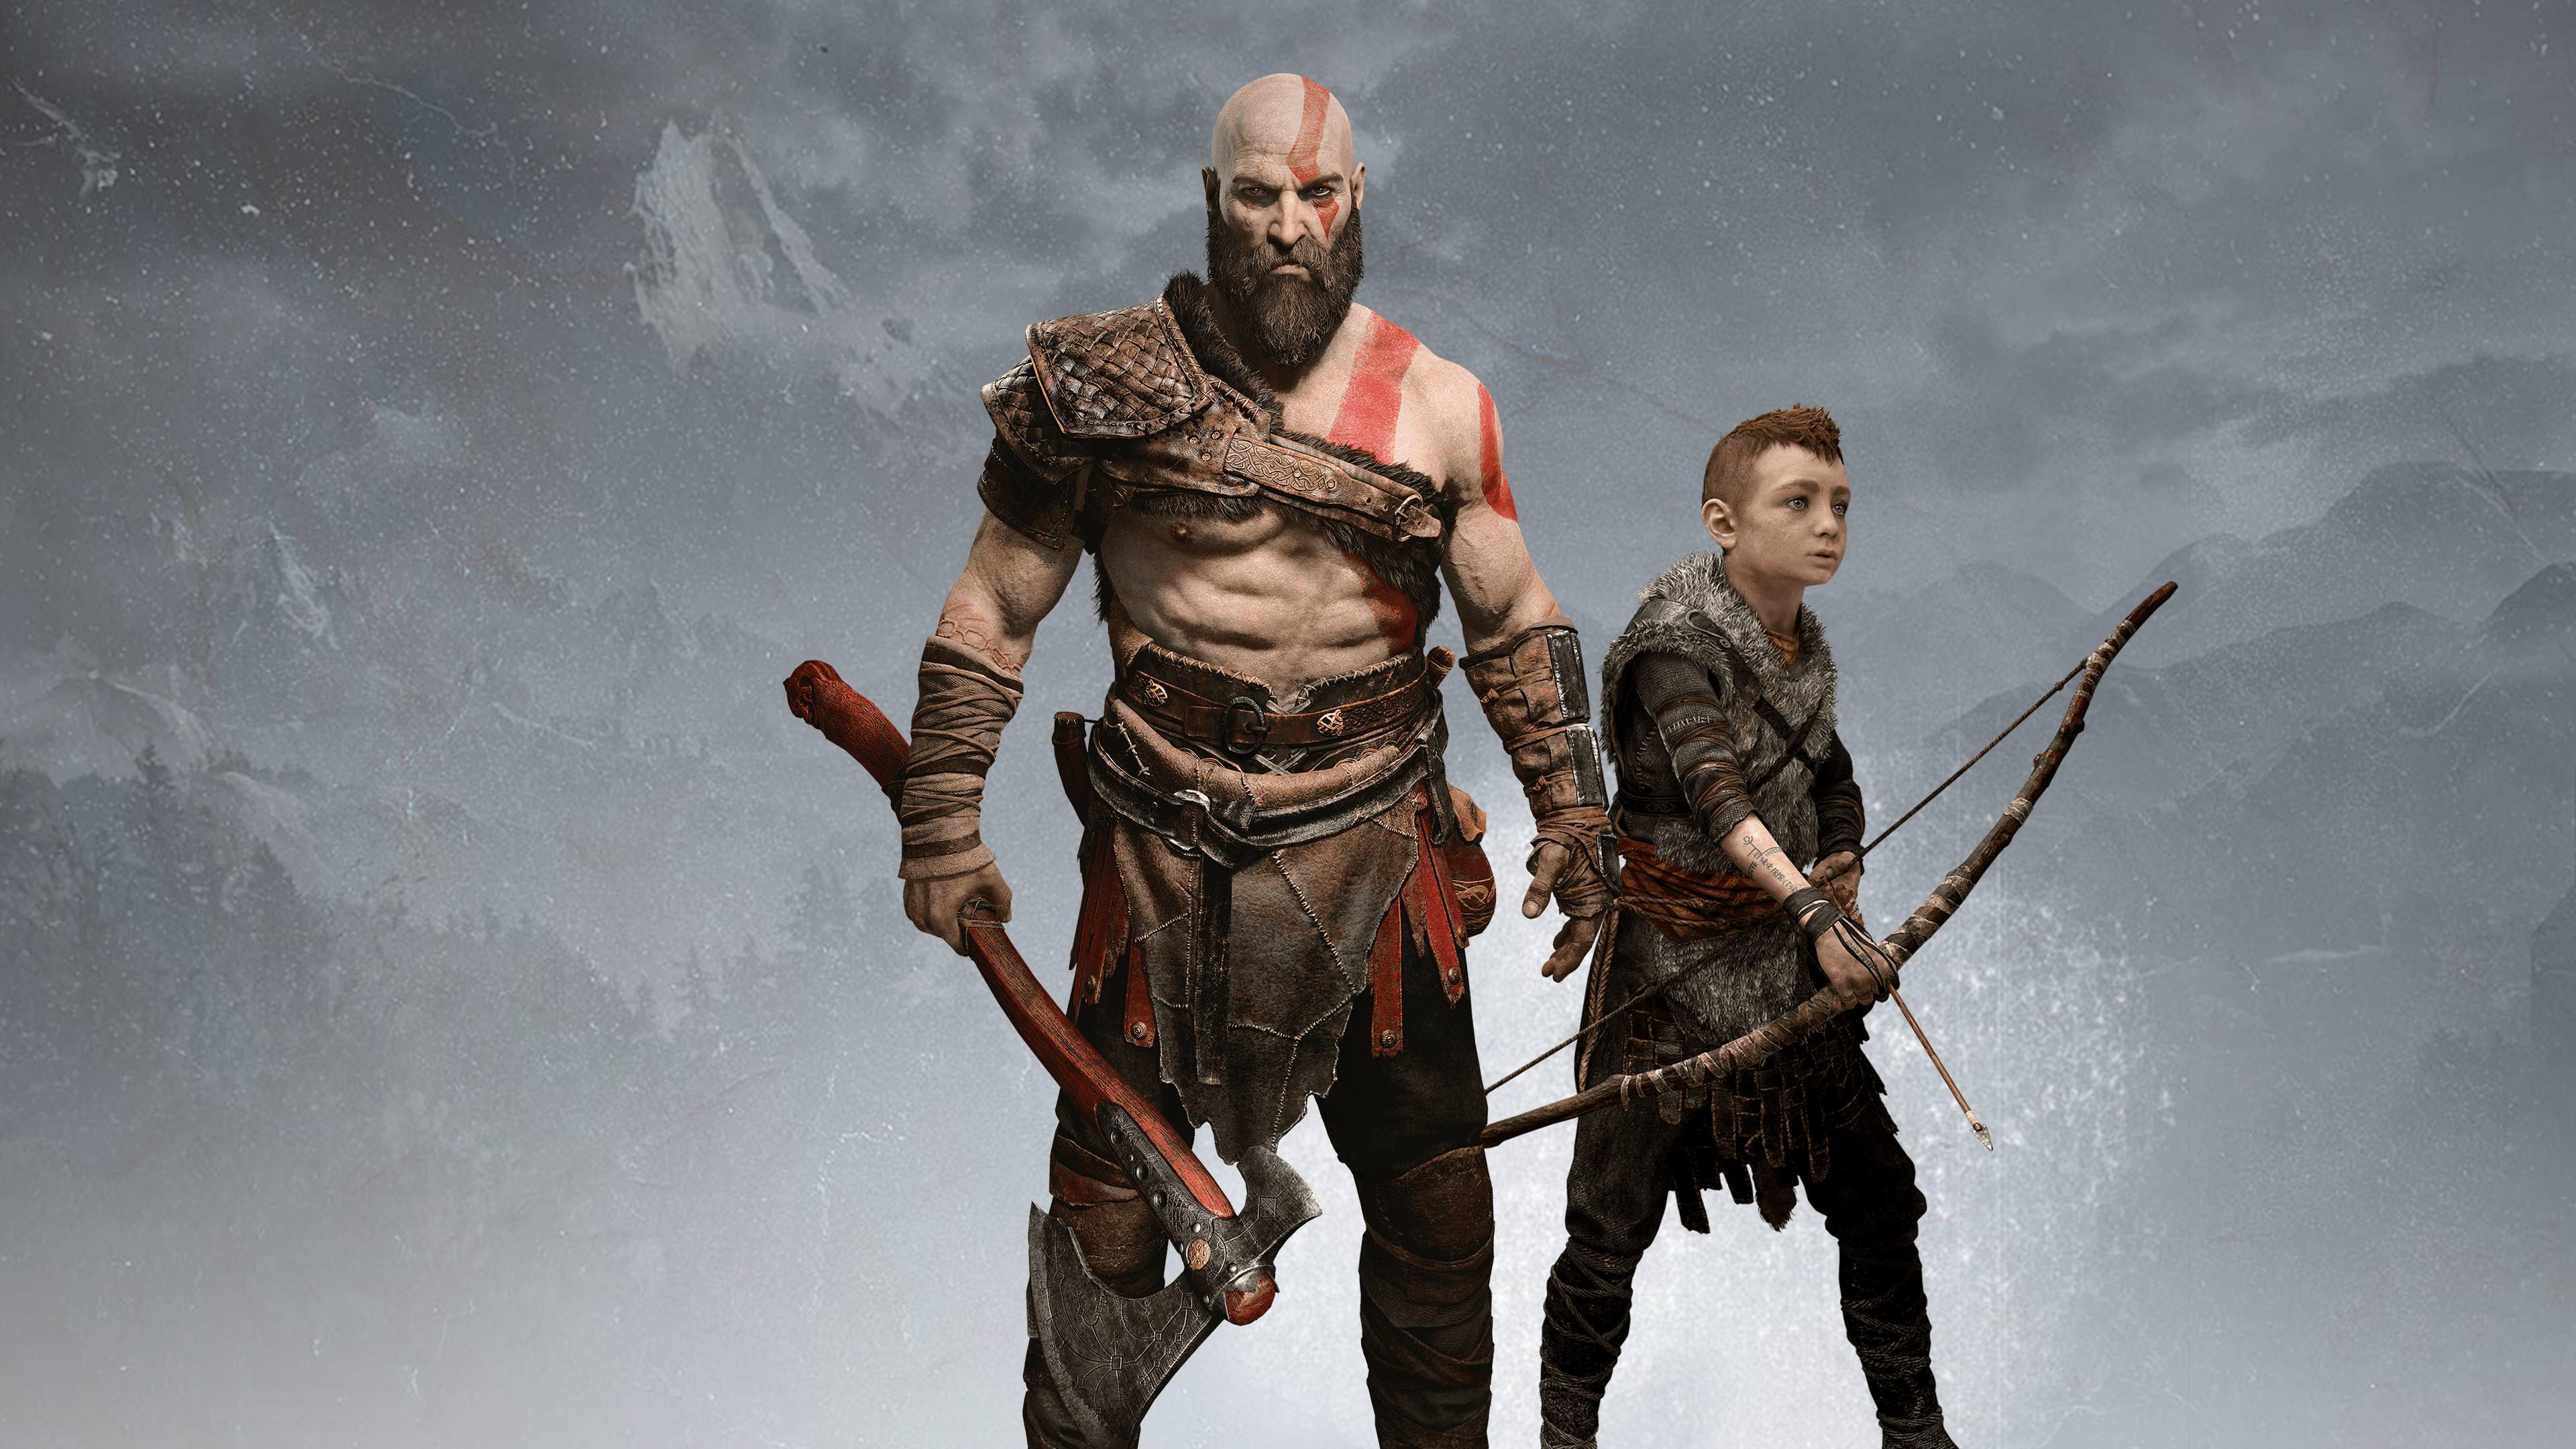 God of war 2018 4k ultra hd wallpaper background image 3840x2160 id 914833 wallpaper abyss - Wallpaper kratos ...